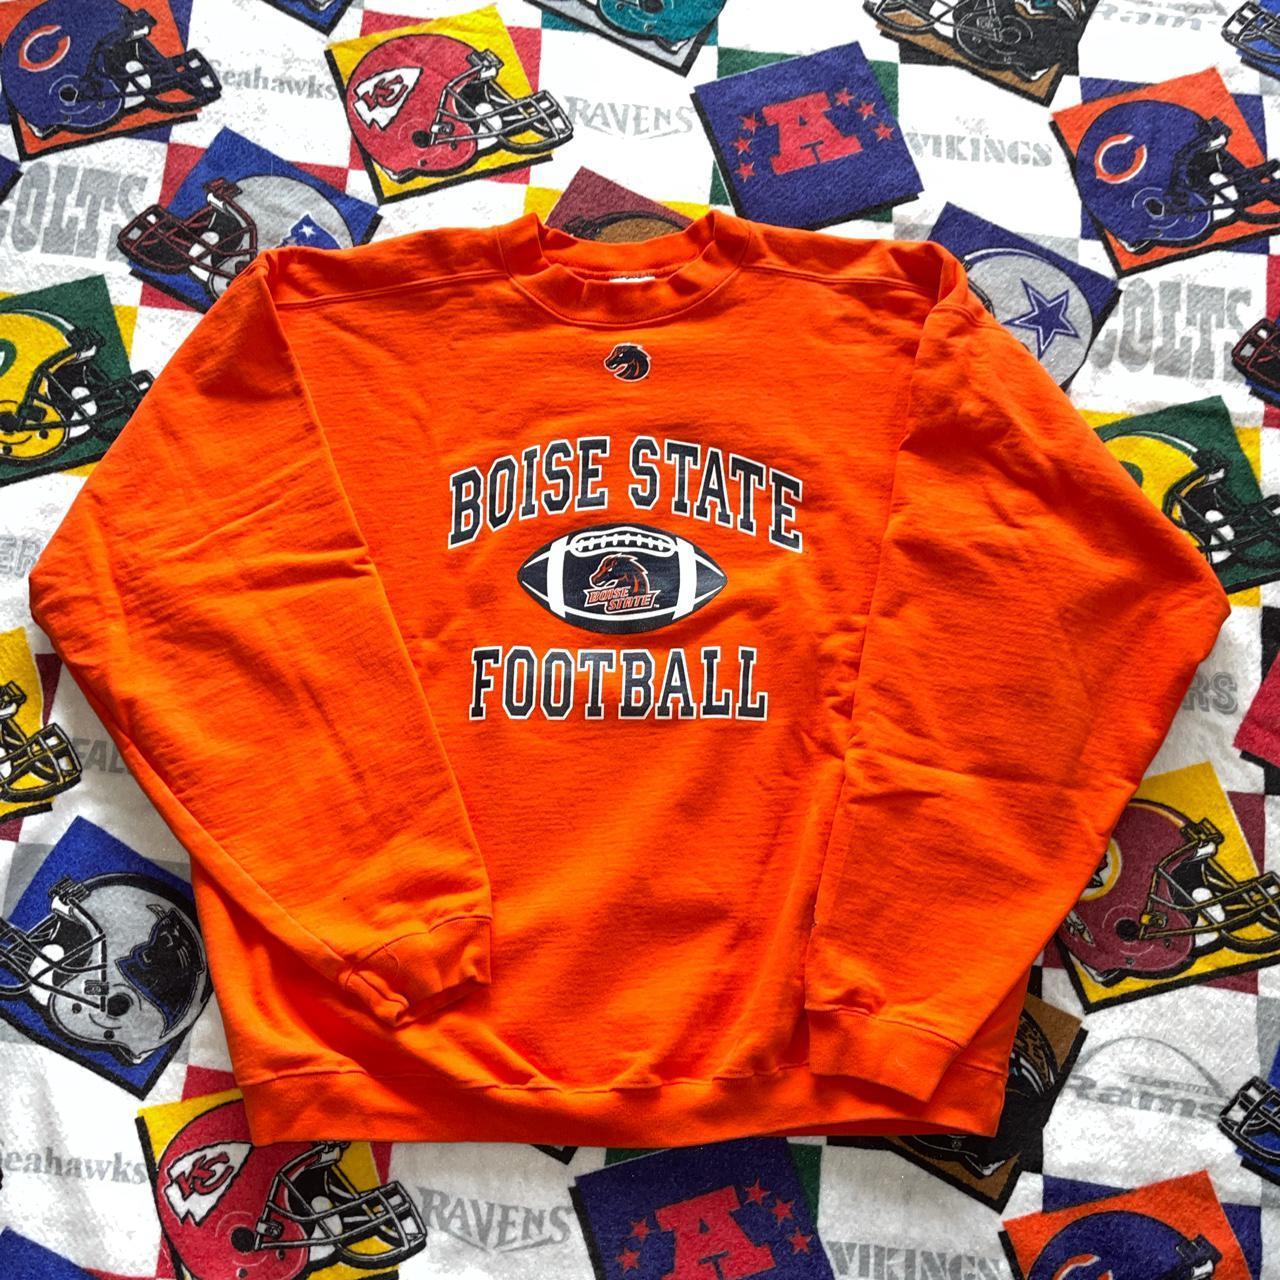 Product Image 1 - Vintage Boise State Football Crewneck